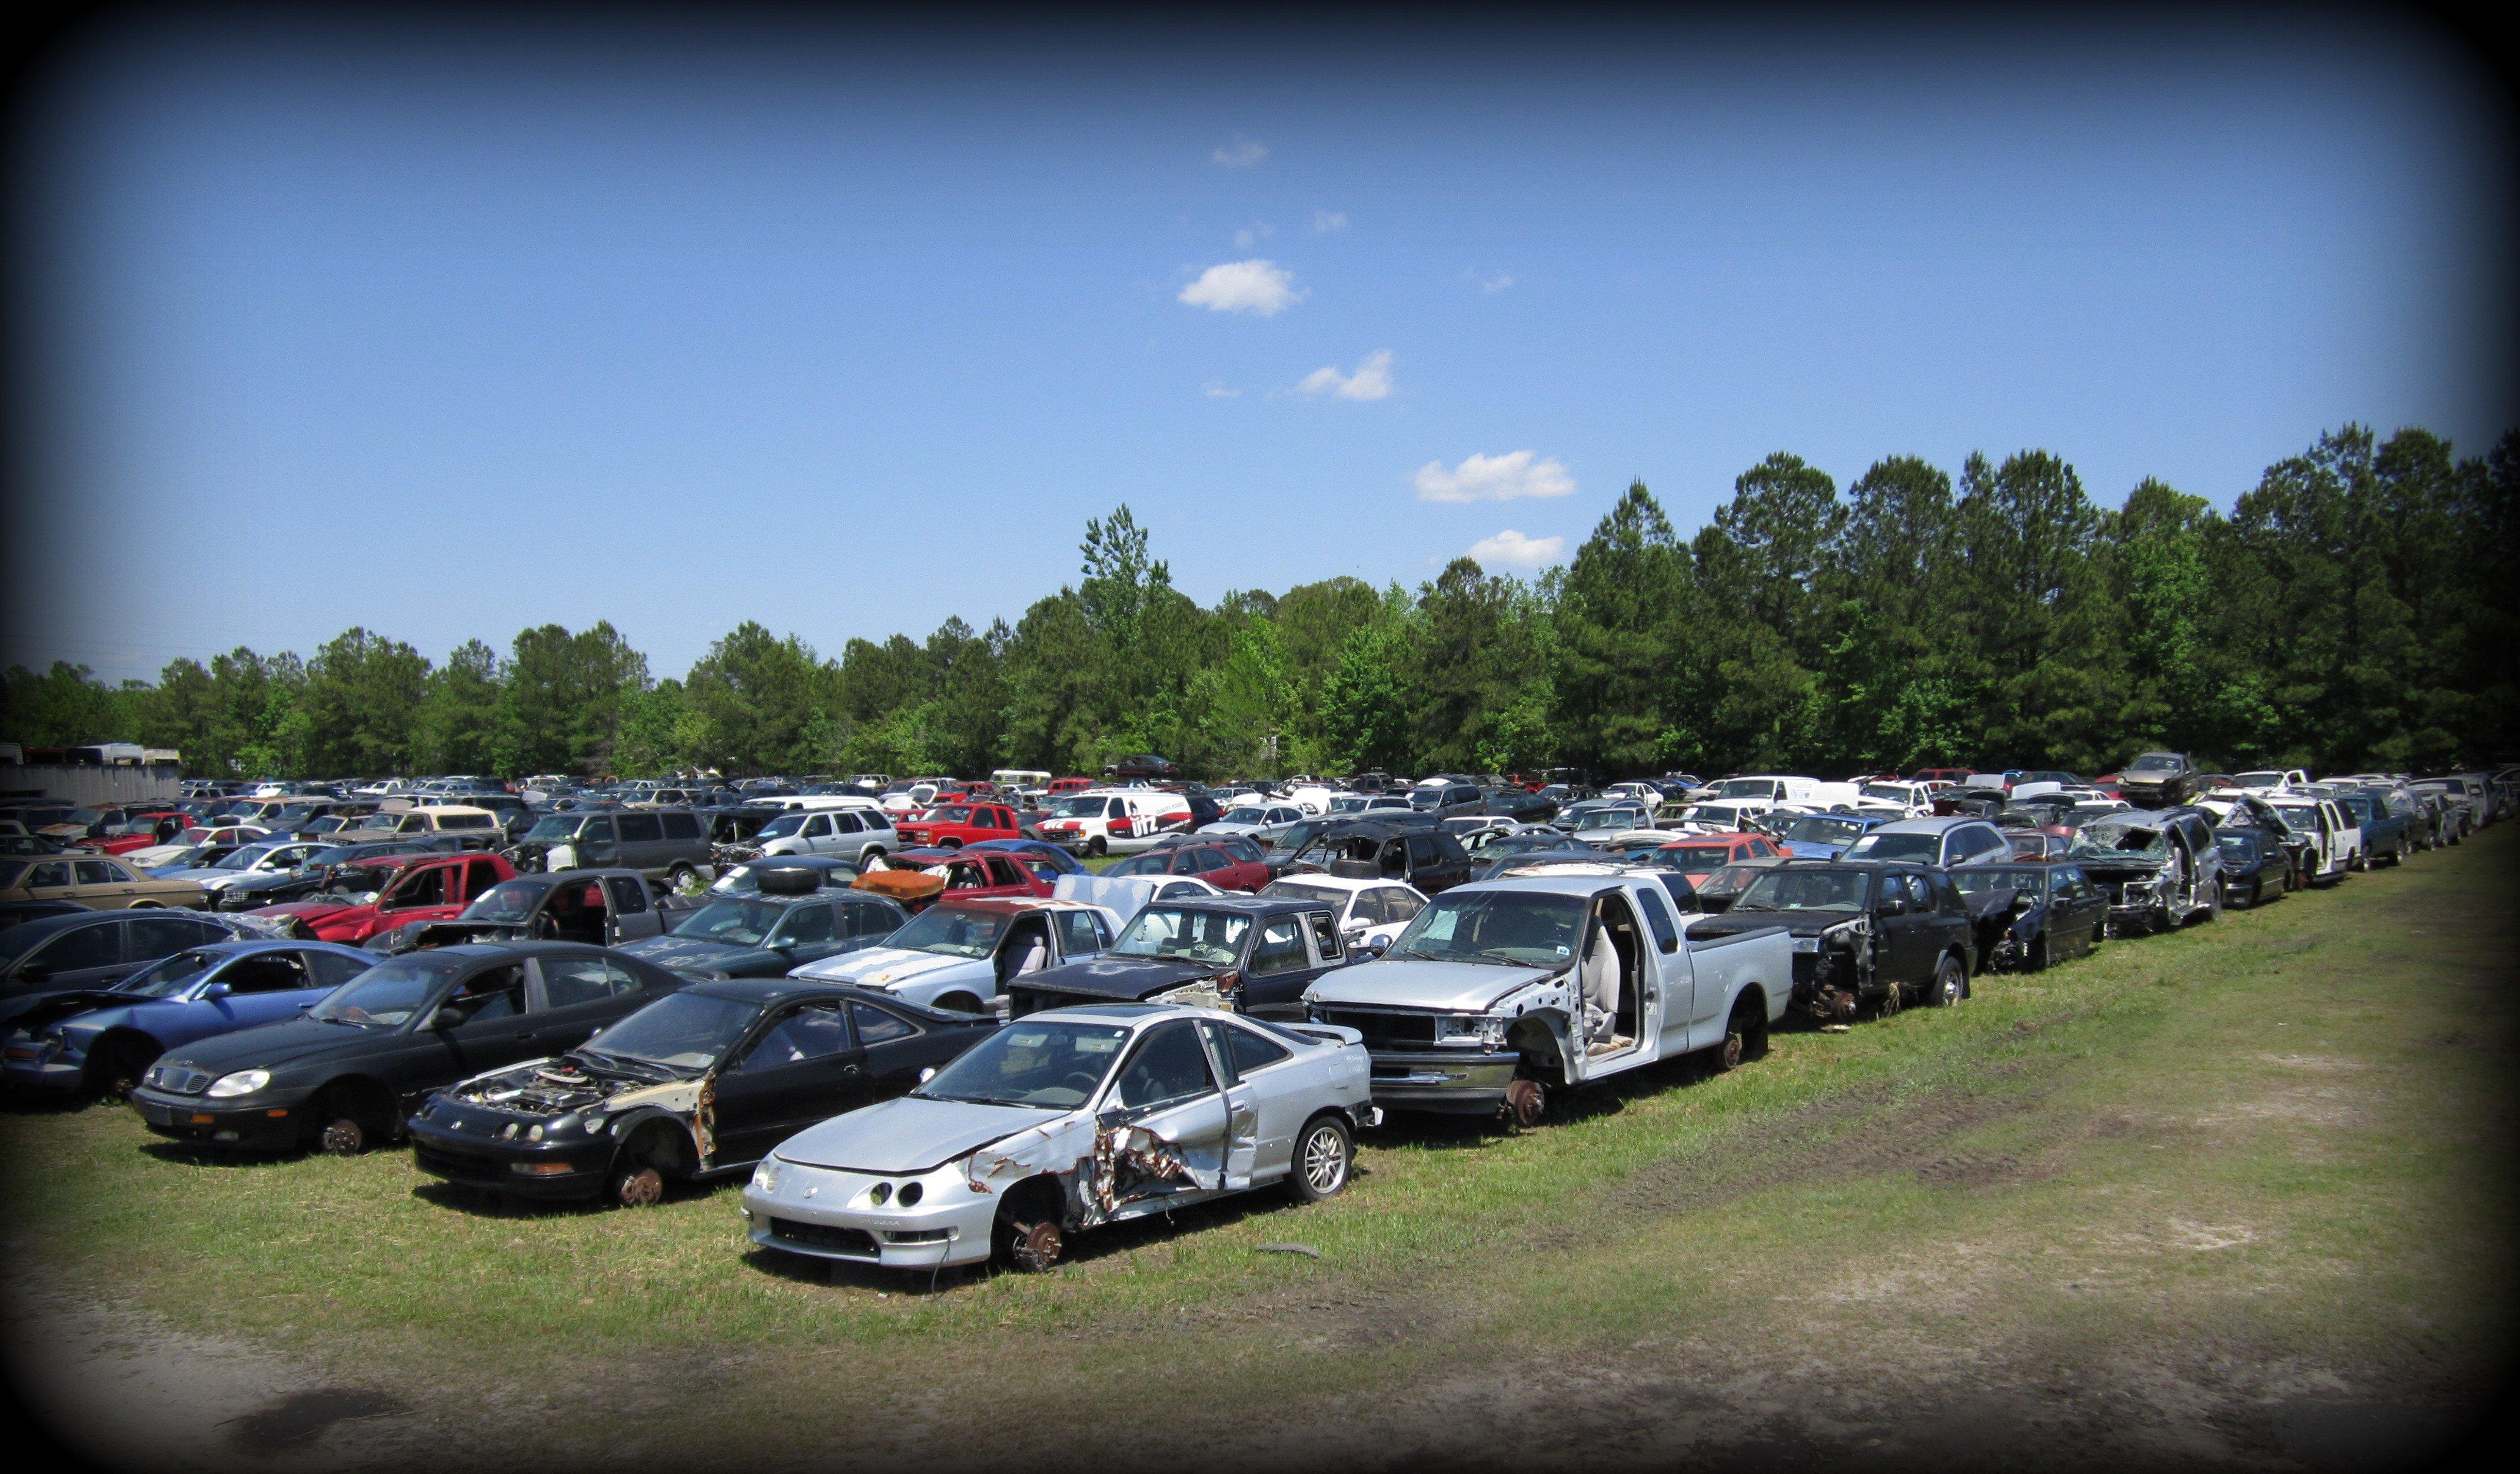 Used Cars Wilmington Nc >> Salvage Yard Wilmington, NC | Lewis Auto Parts | Used Auto Parts Leland, NC